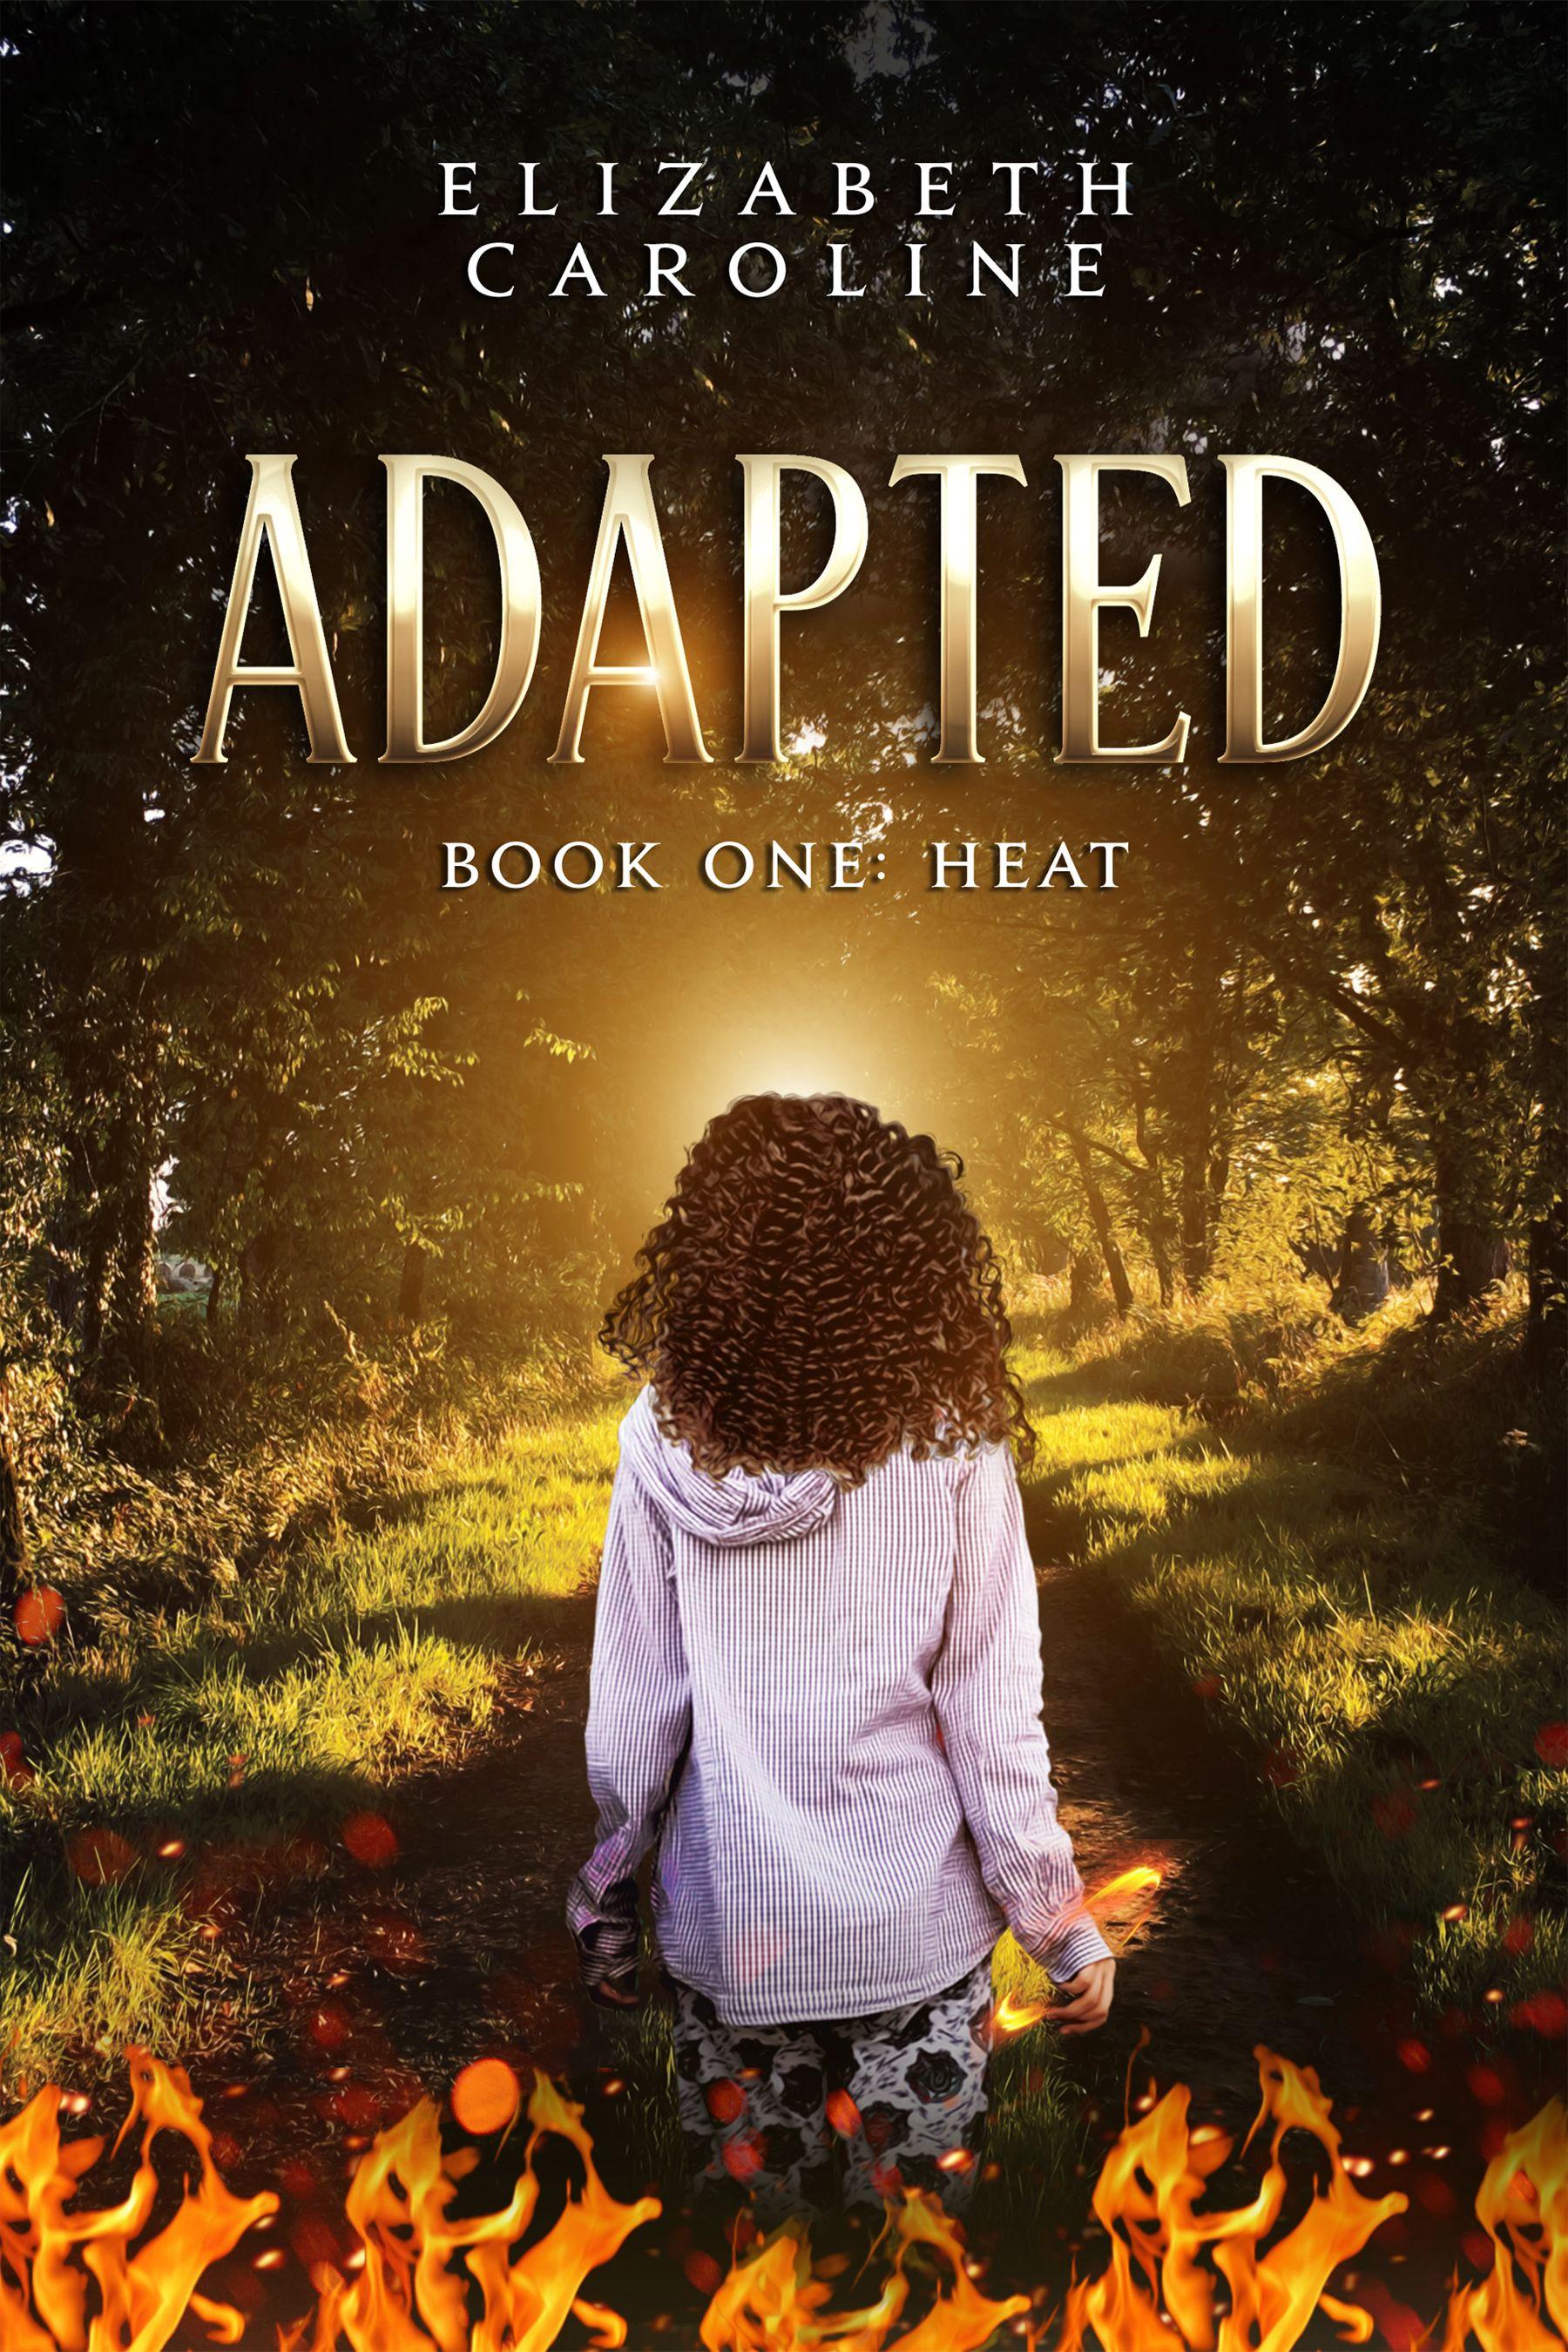 Adapted, book 1: Heat